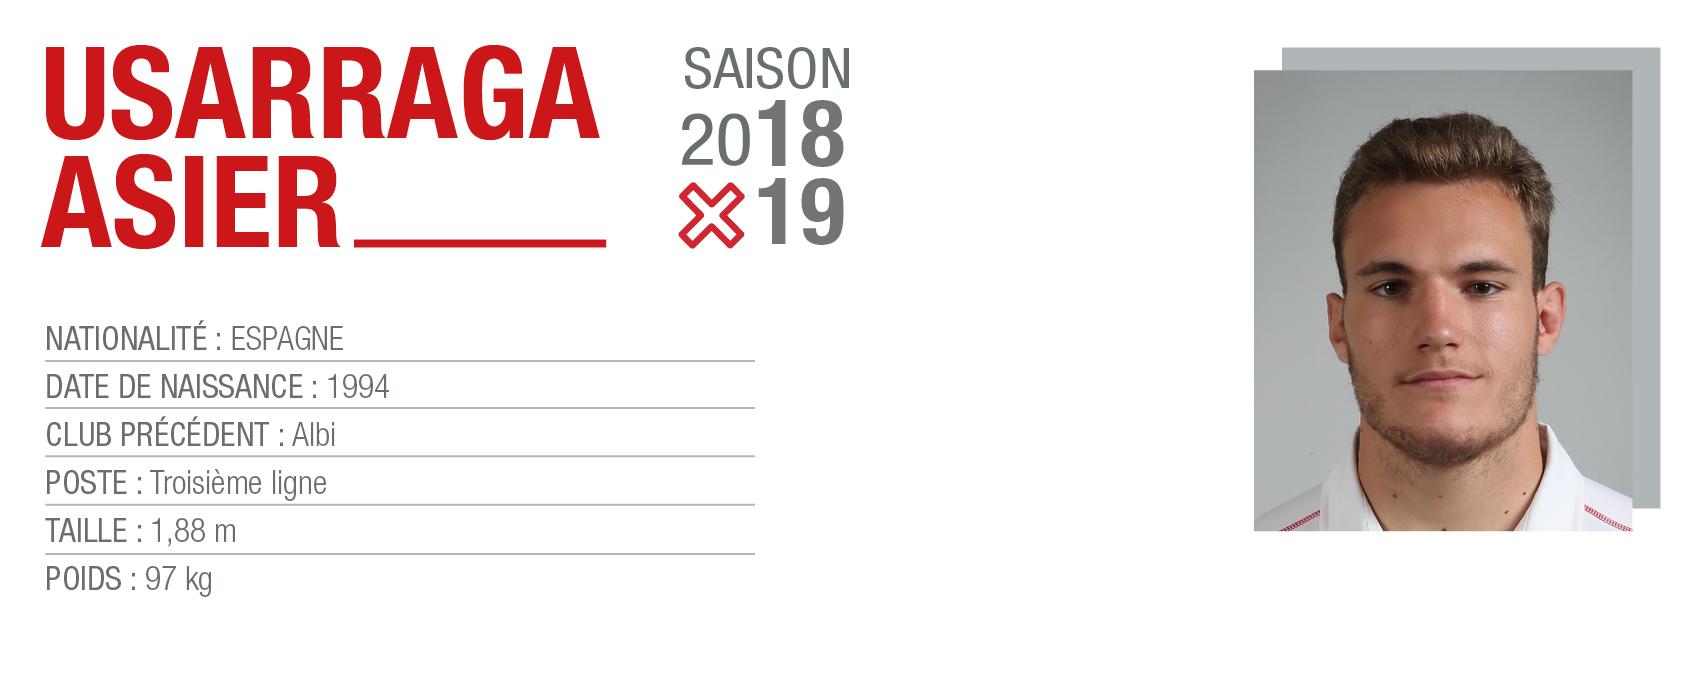 SAISON 2018 - 2019 - Page 2 5b2393c5c8879b393409dd39